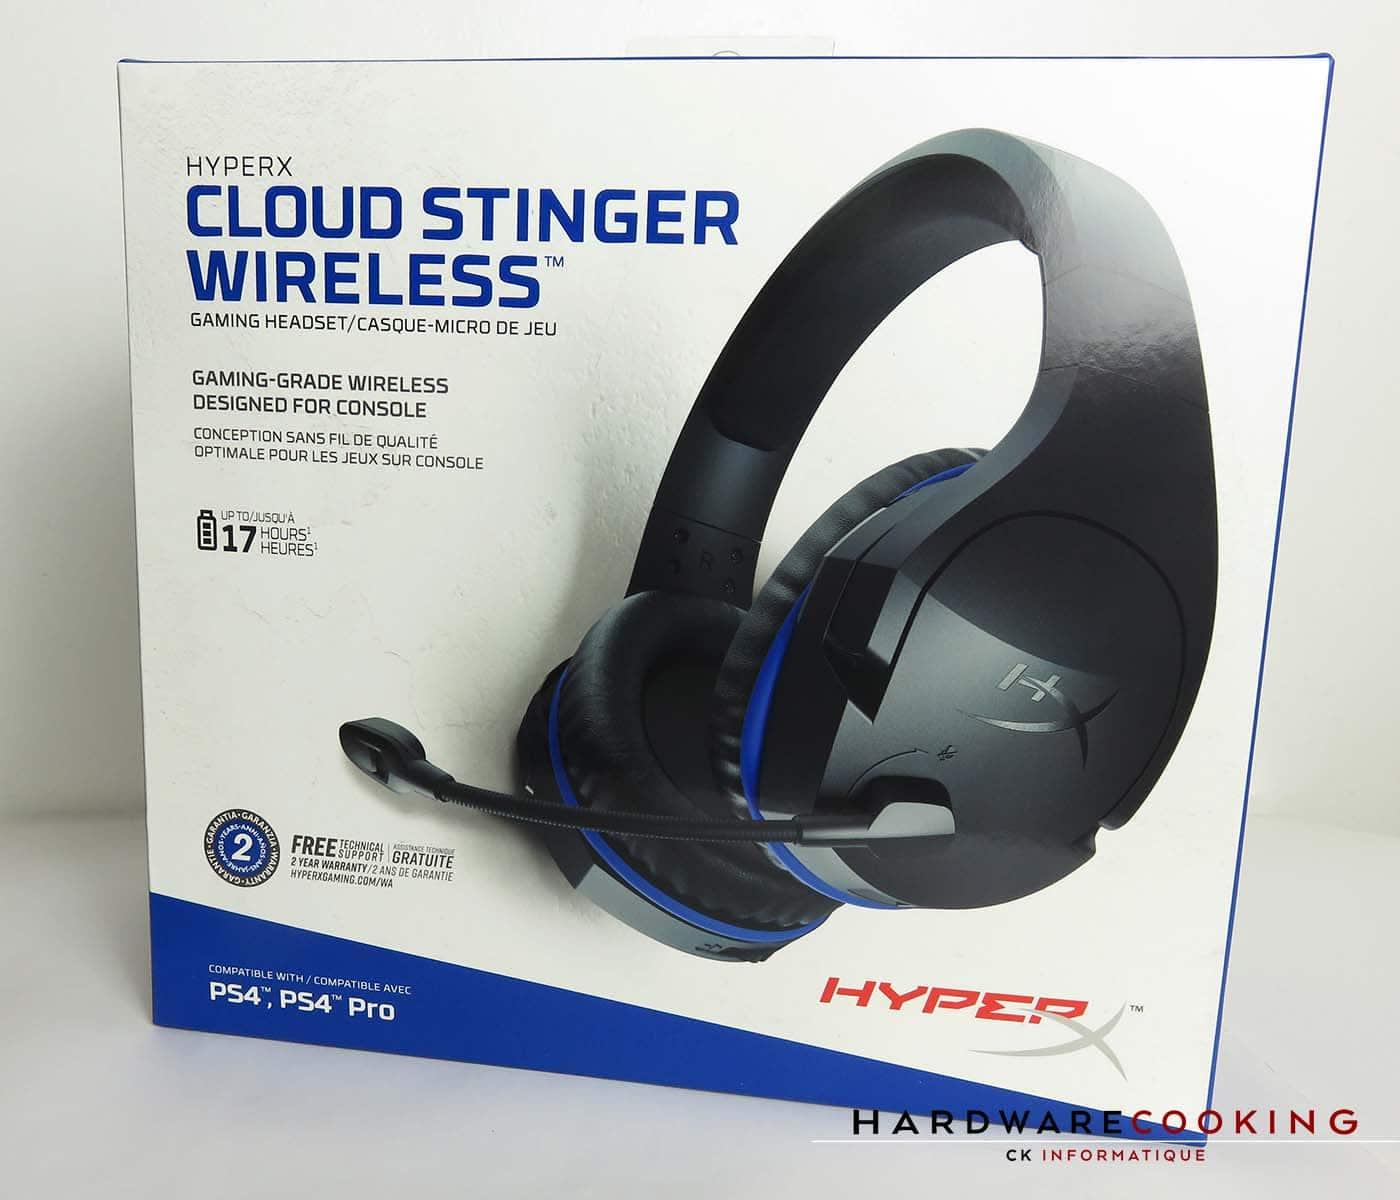 casque hyperx cloud stinger gaming tesdt